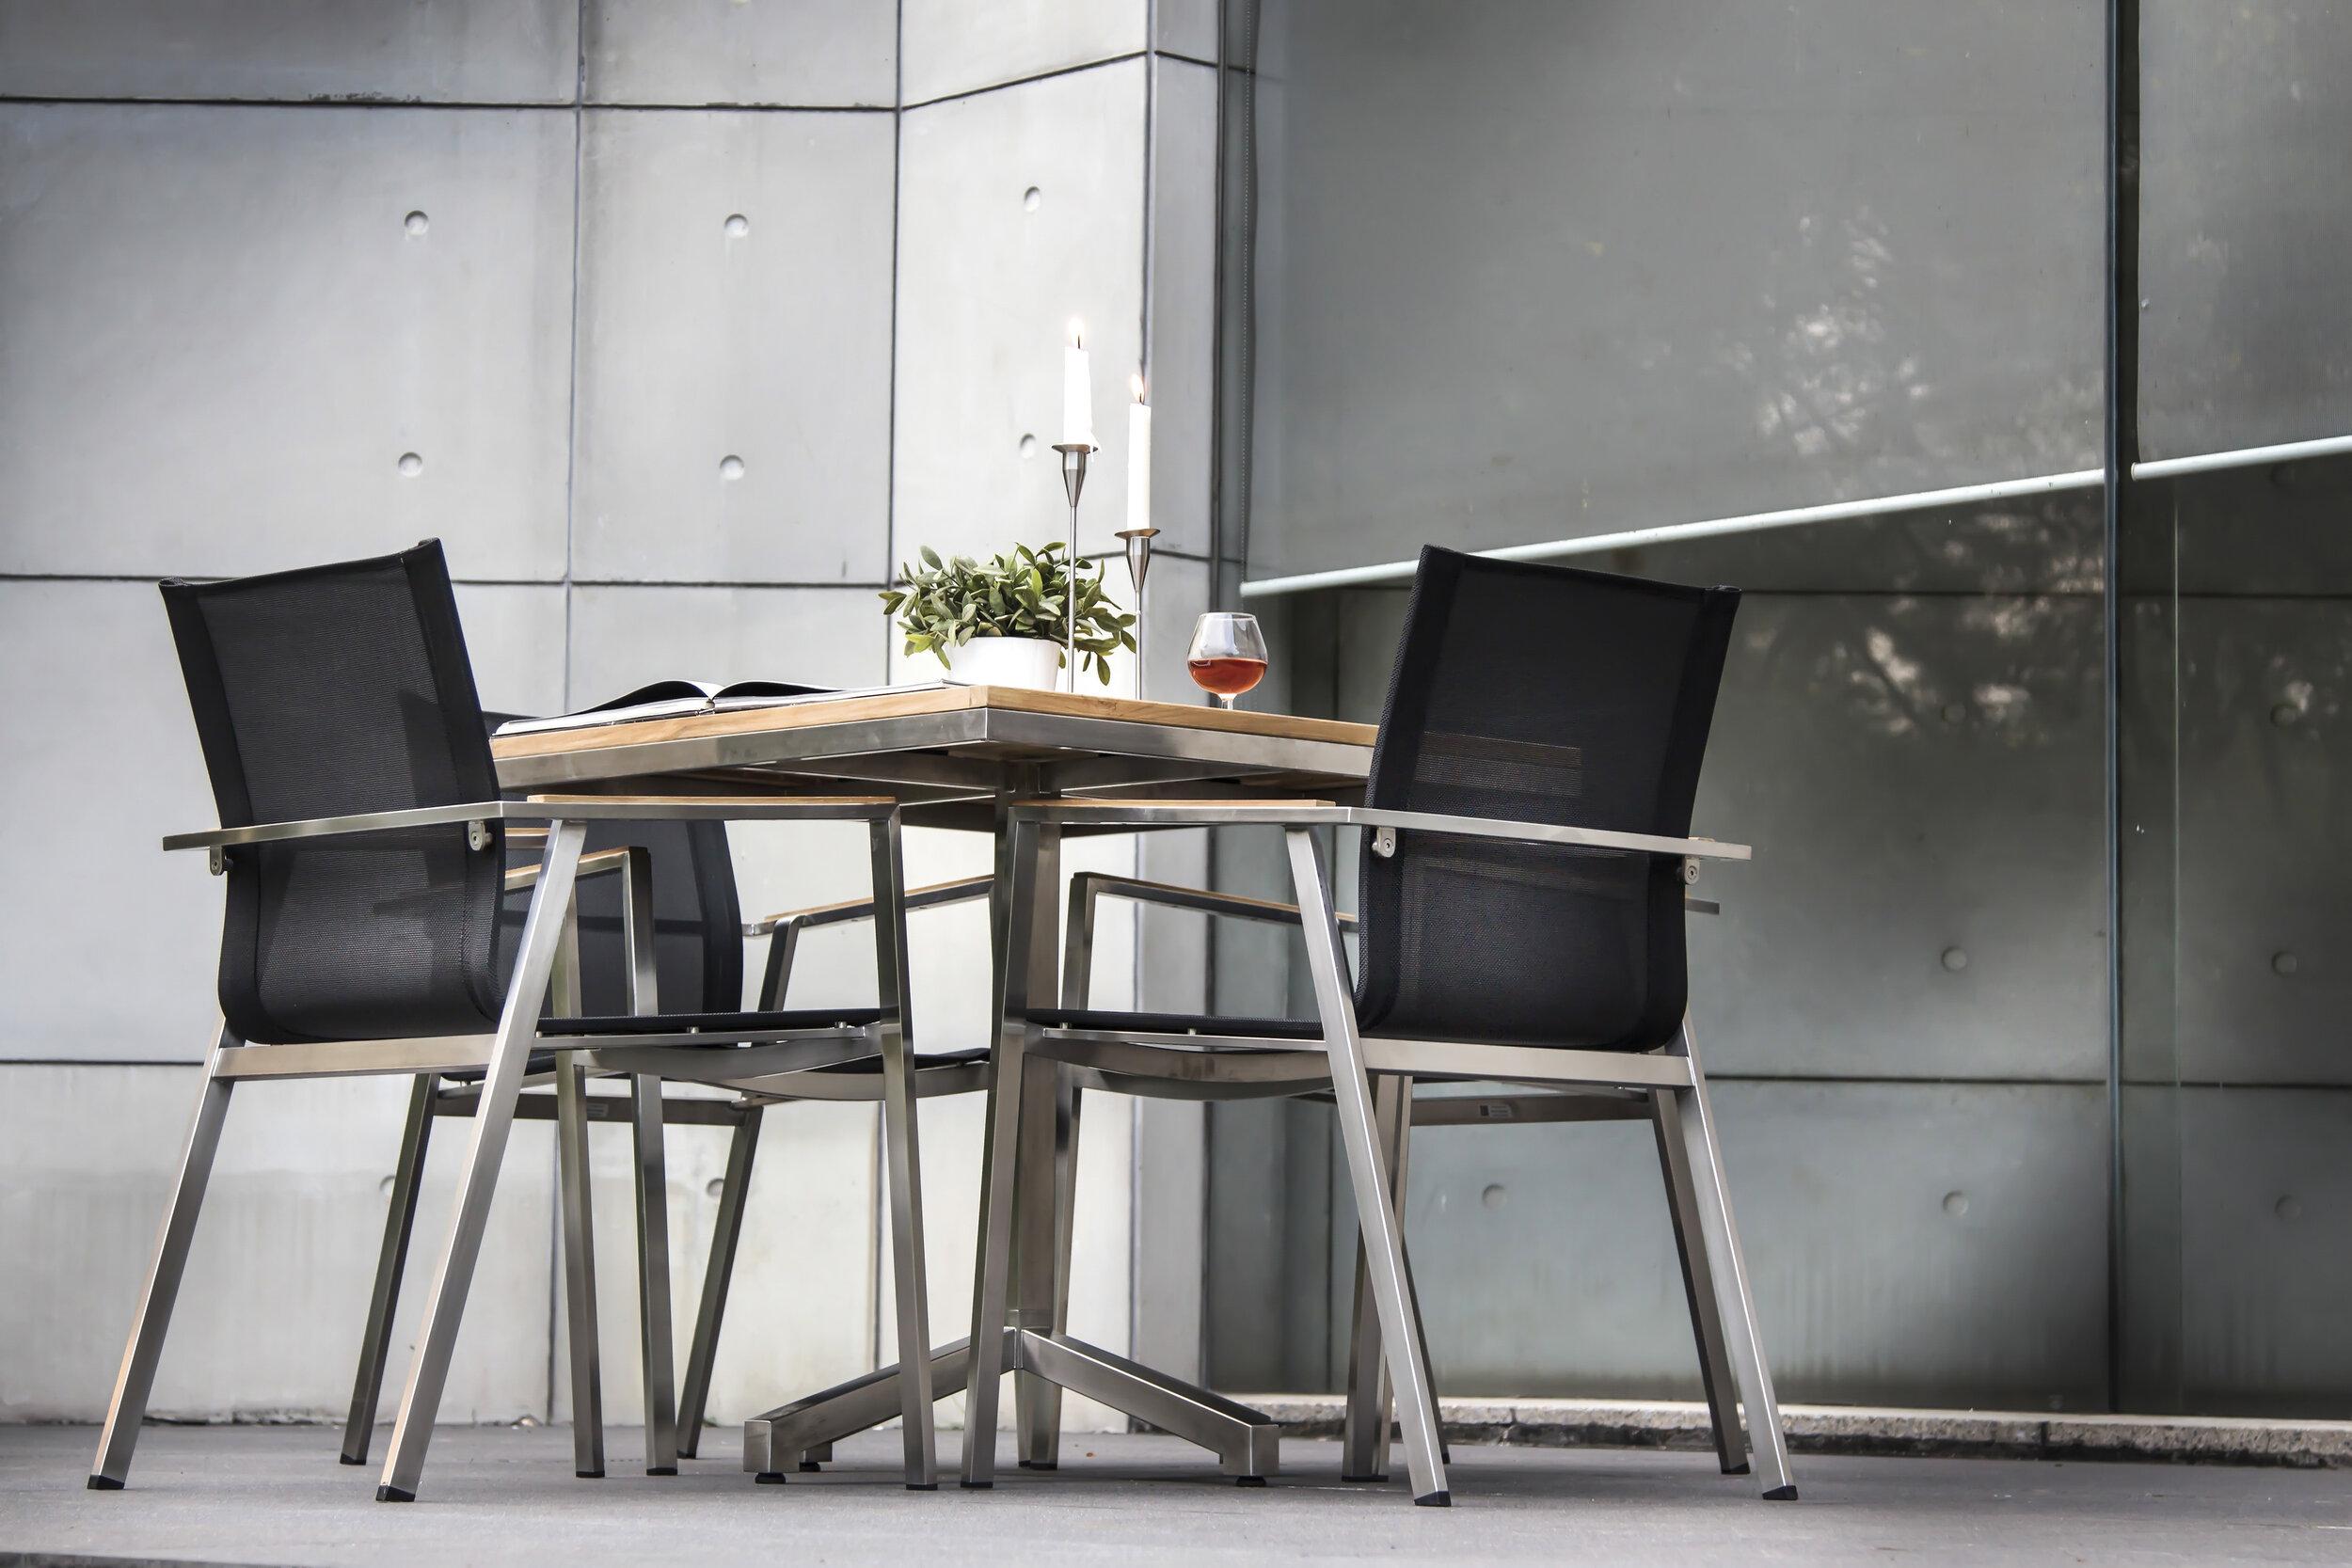 FRANK - Designed by Danish designer Povl Eskildsen